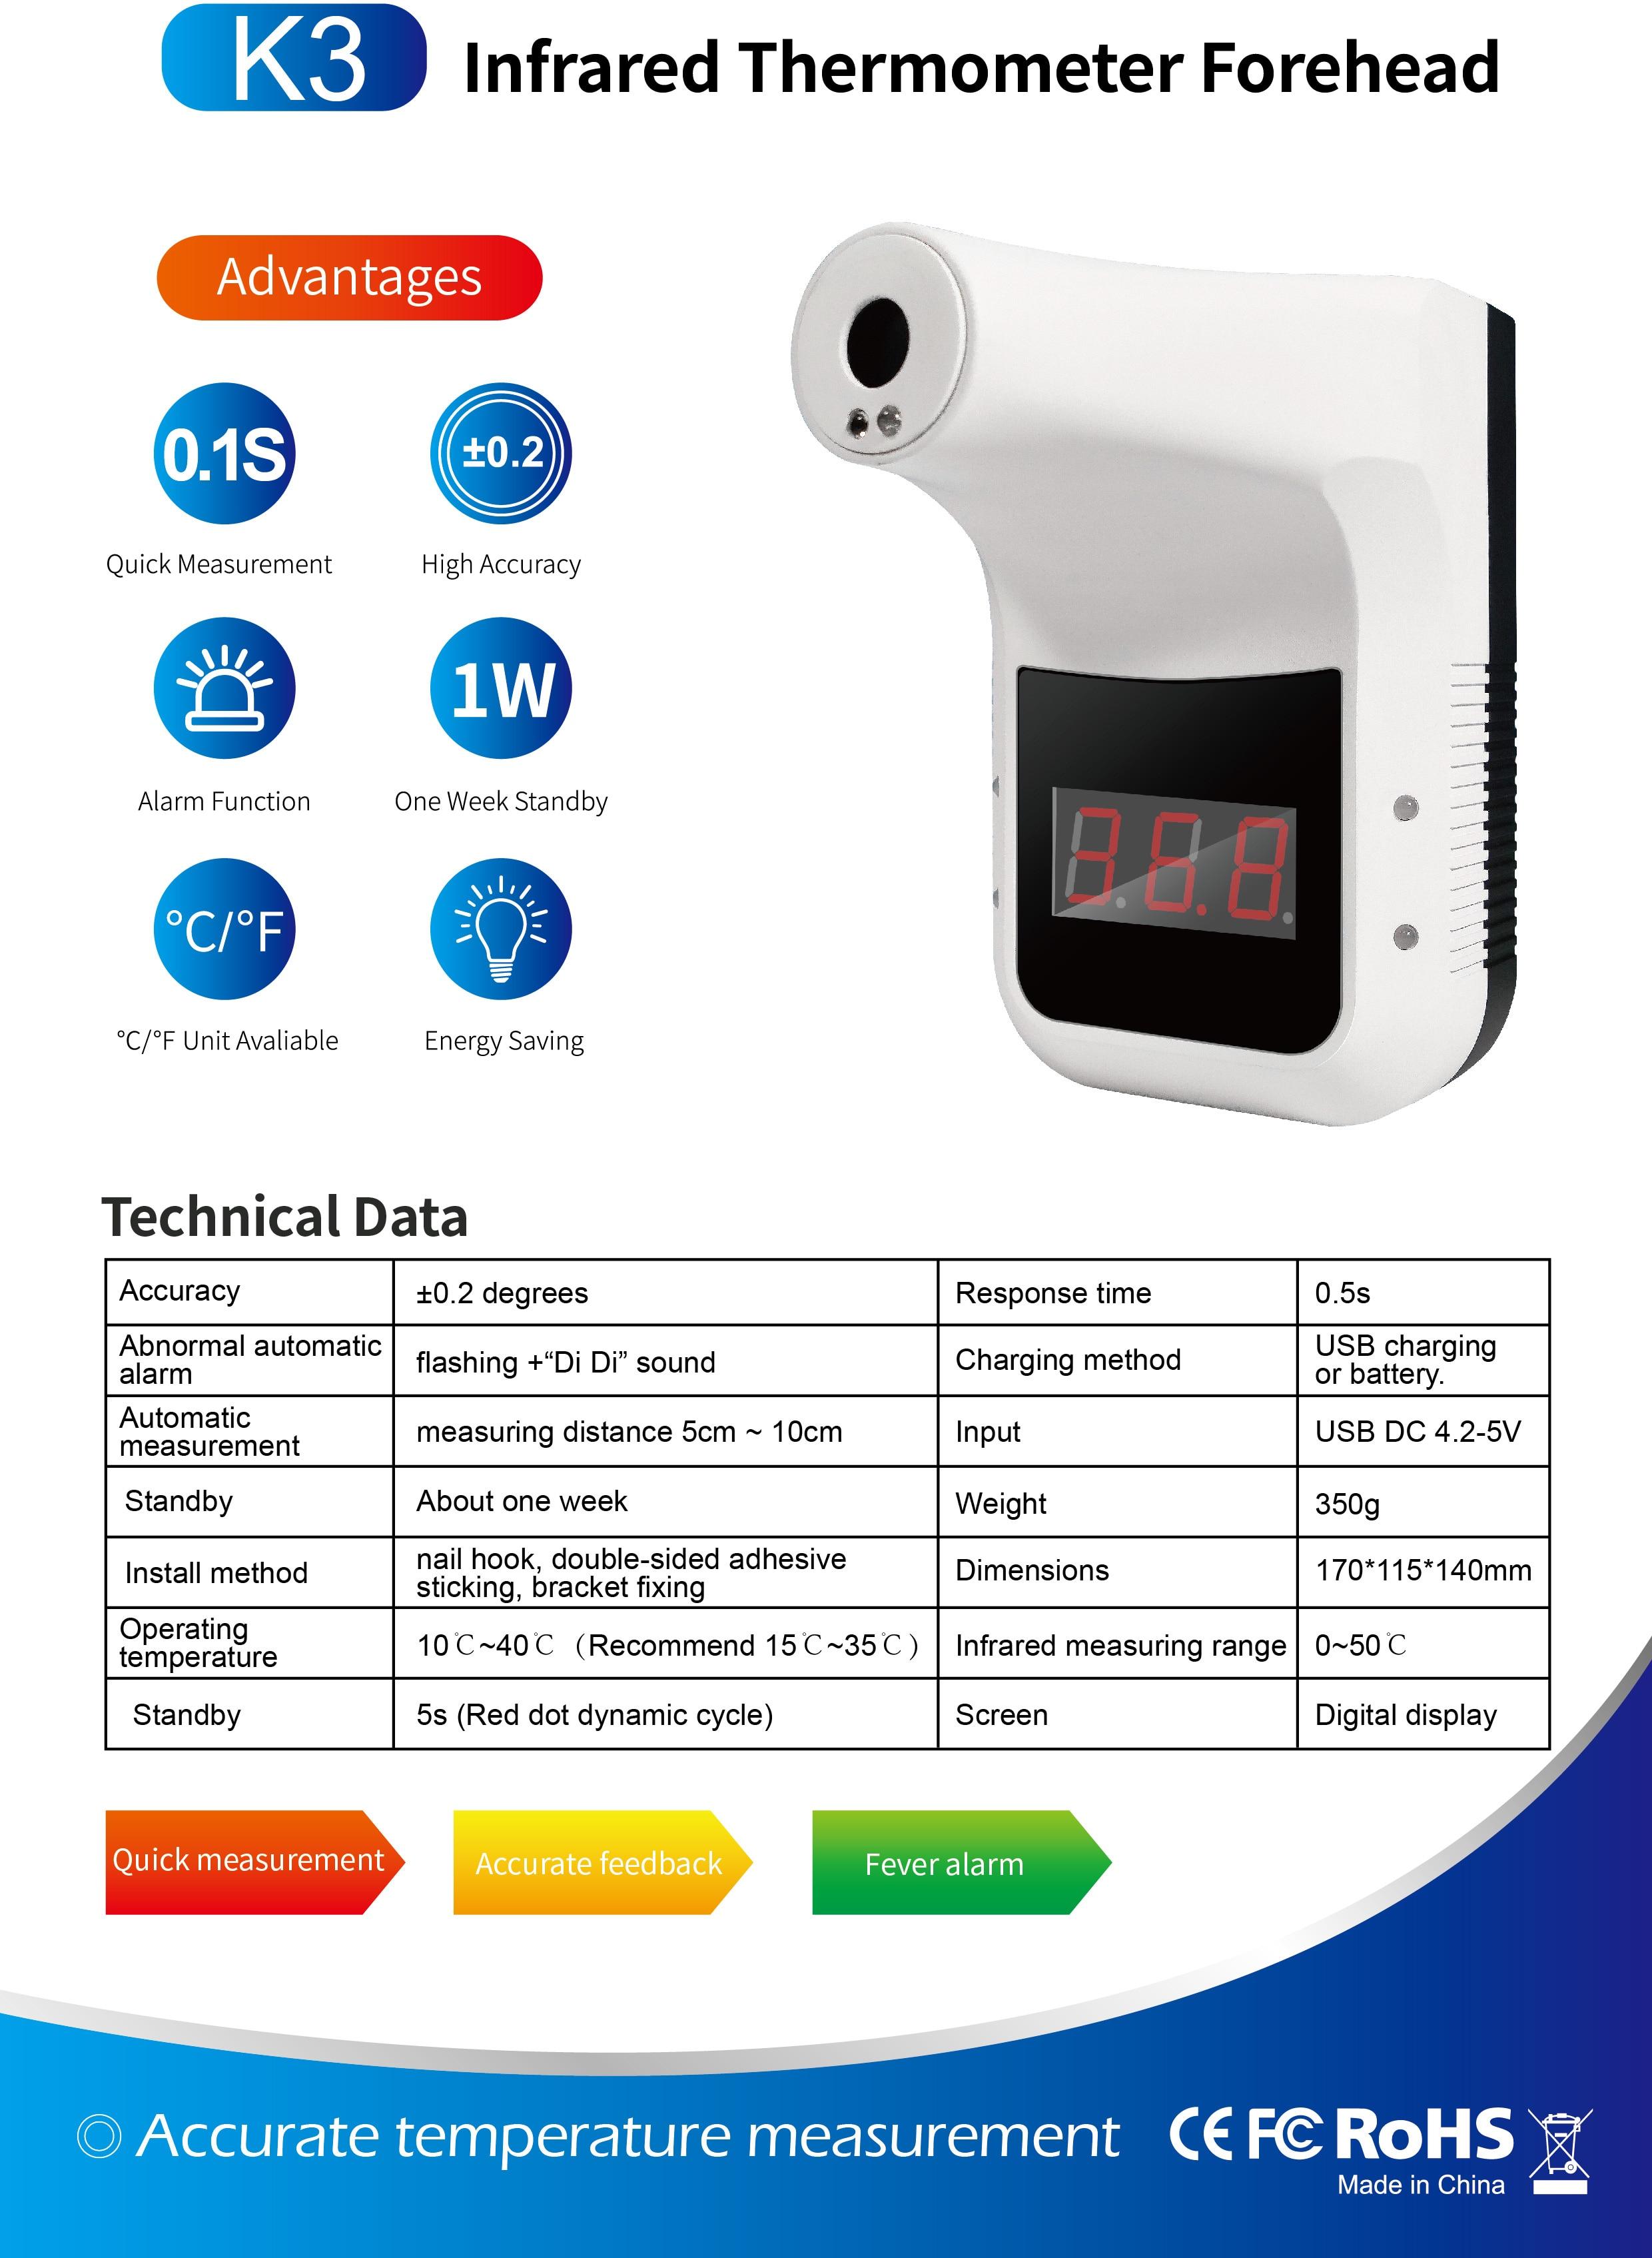 Hefccc32379b54aa09c4c28095c8f9308b - ที่วัดไข้ K3 พร้อมขาตั้ง ติดกำแพง ผนัง เสา ร้านค้า สำนักงาน เครื่องวัดอุณหภูมิ อินฟราเรด มีแอพฯ LCD Digital Smart Termometor